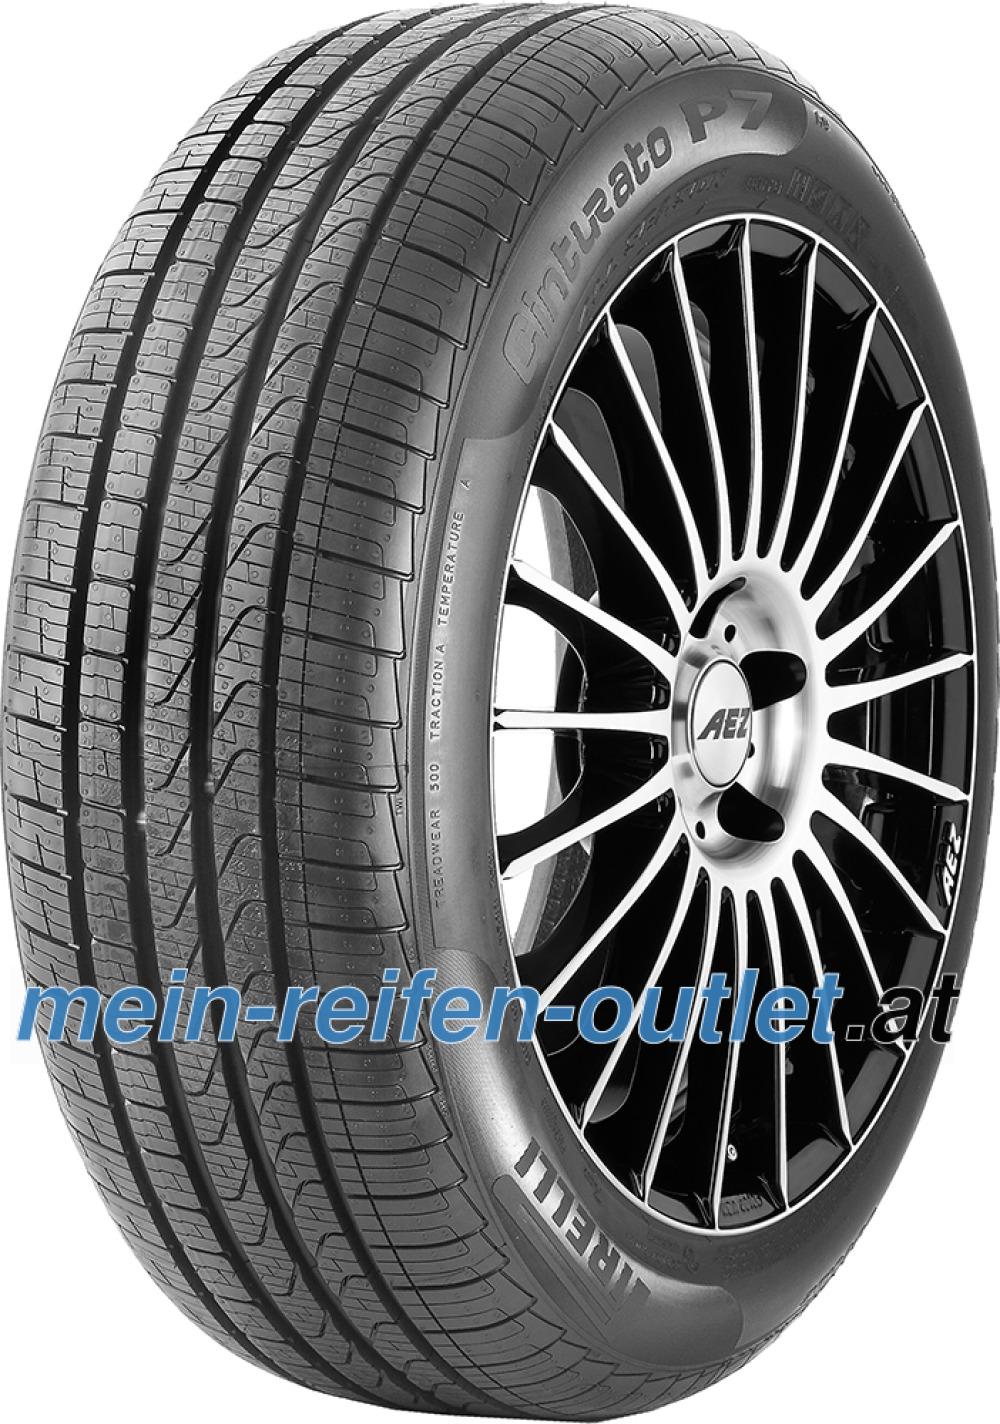 Pirelli Cinturato P7 A/S runflat ( 245/50 R18 100V *, ECOIMPACT, mit Felgenschutz (MFS), runflat )